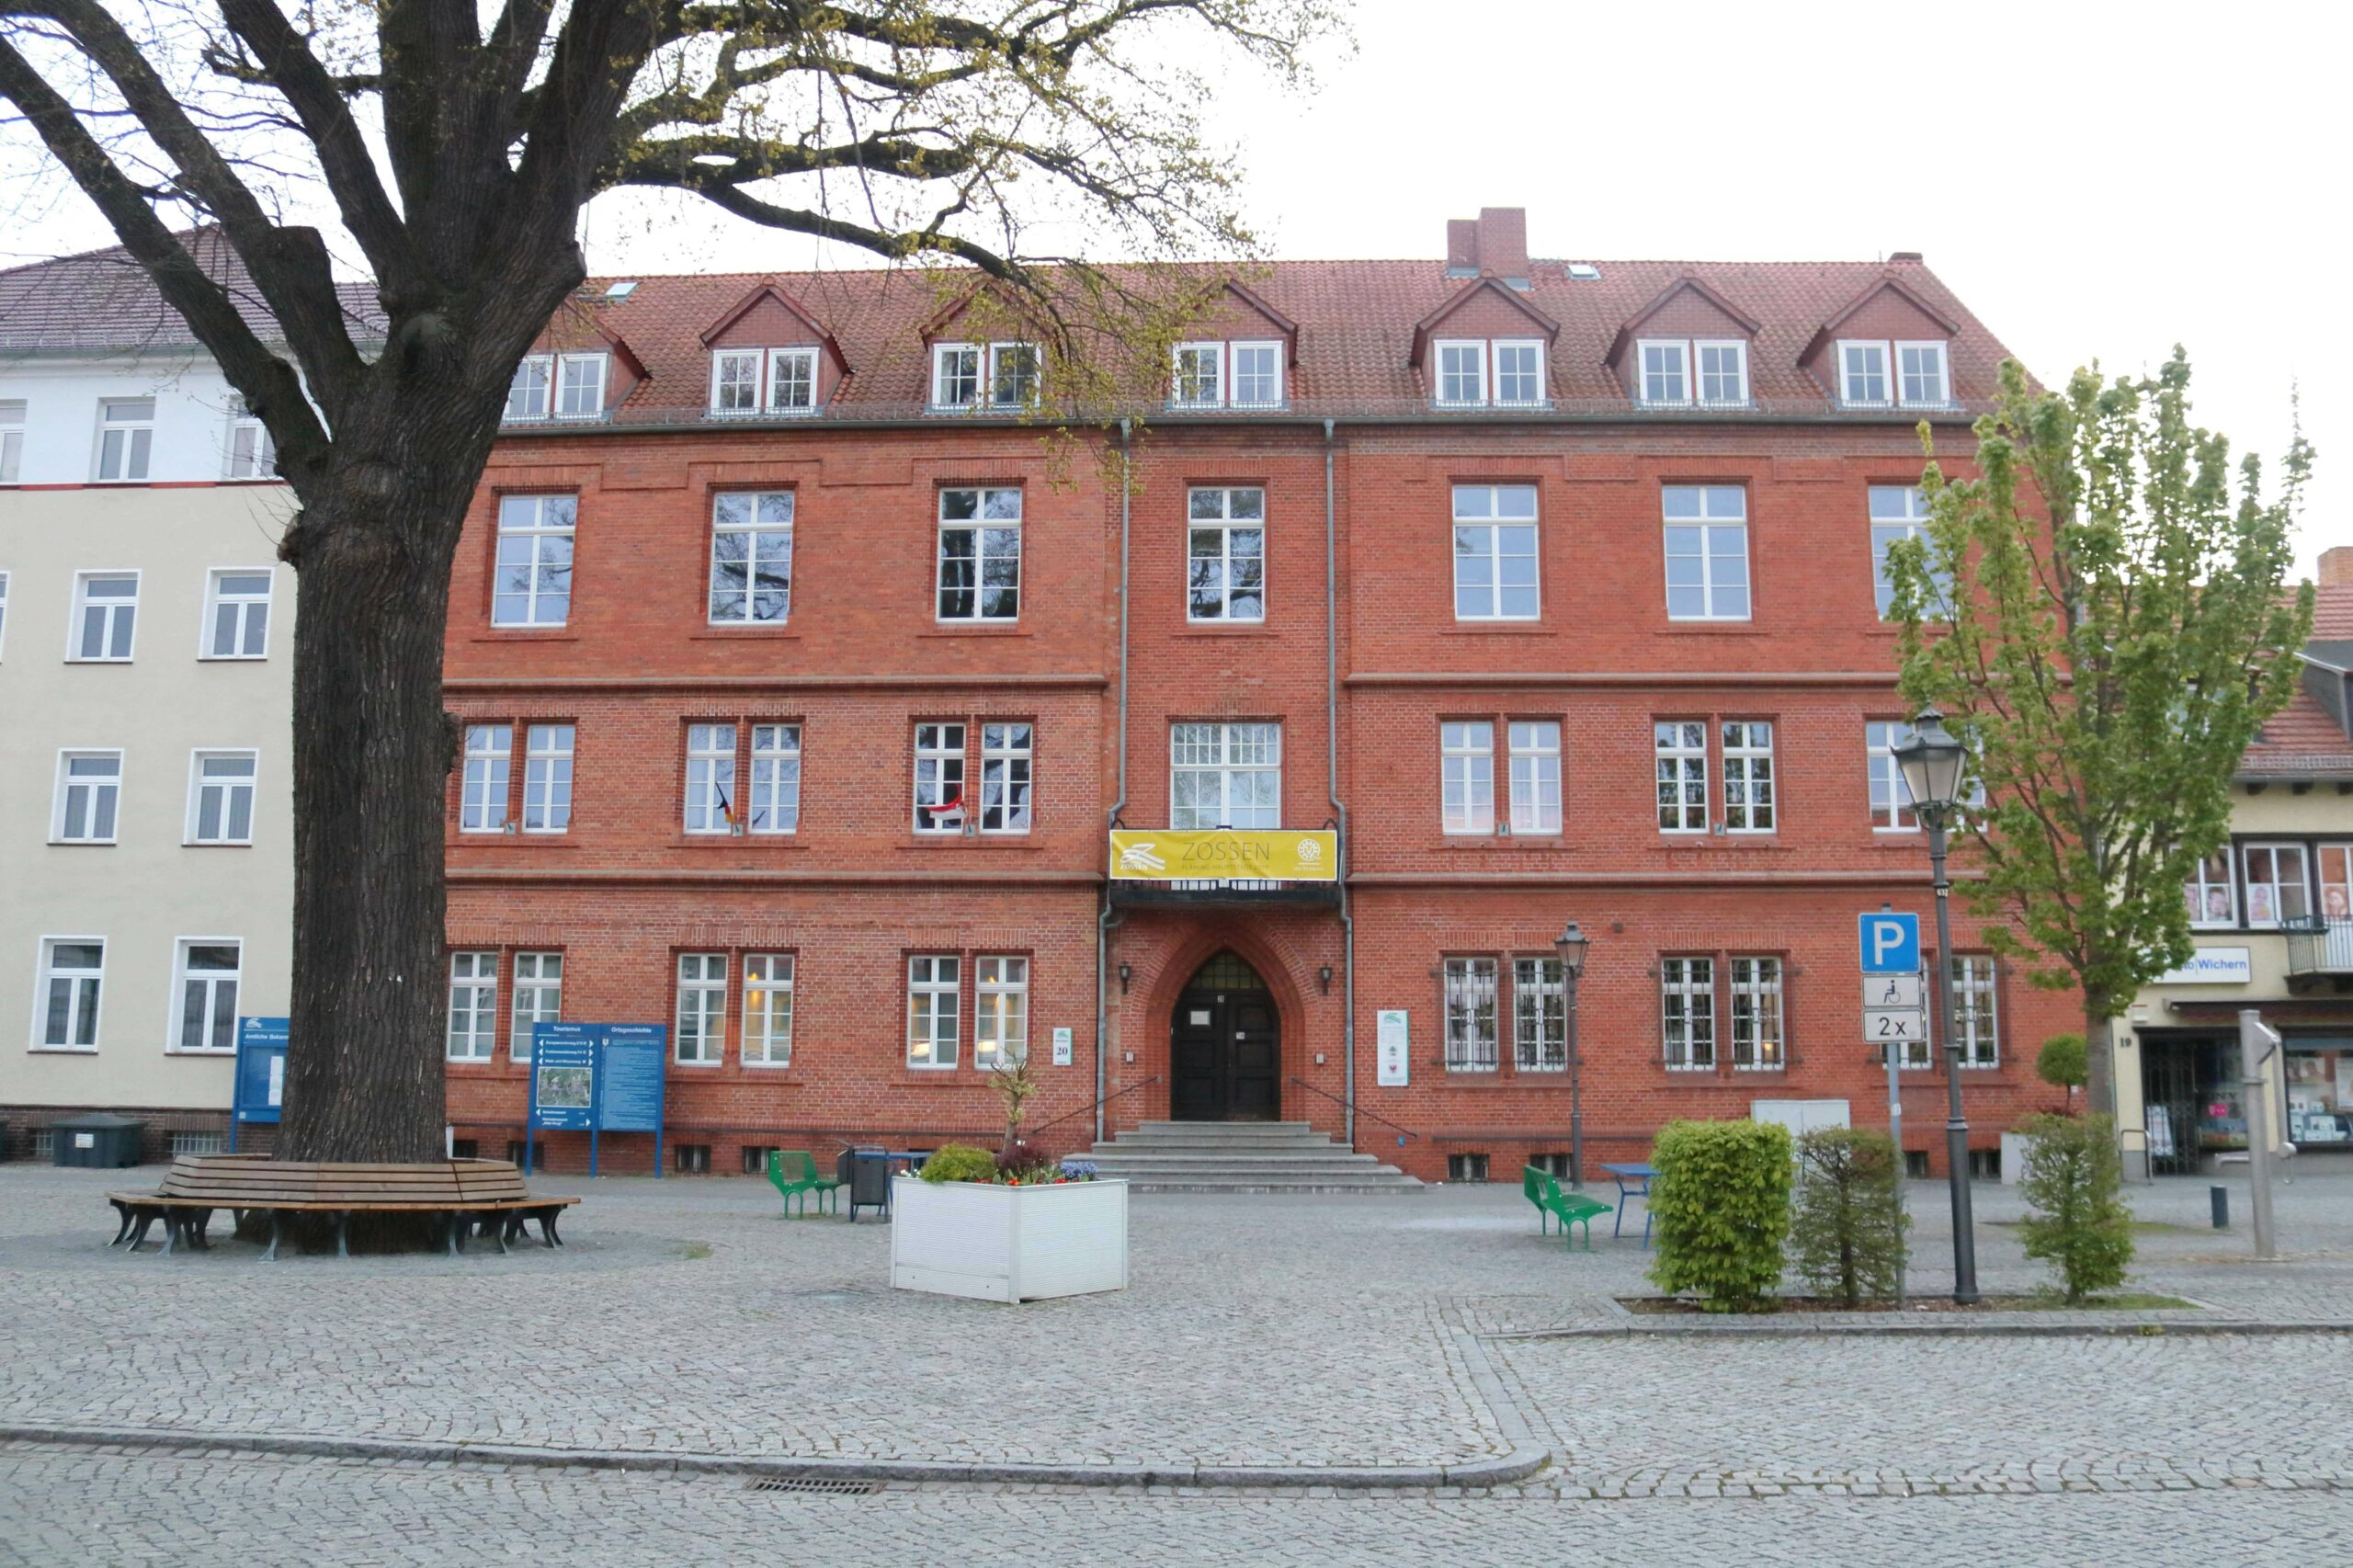 Bürgeramt Zossen